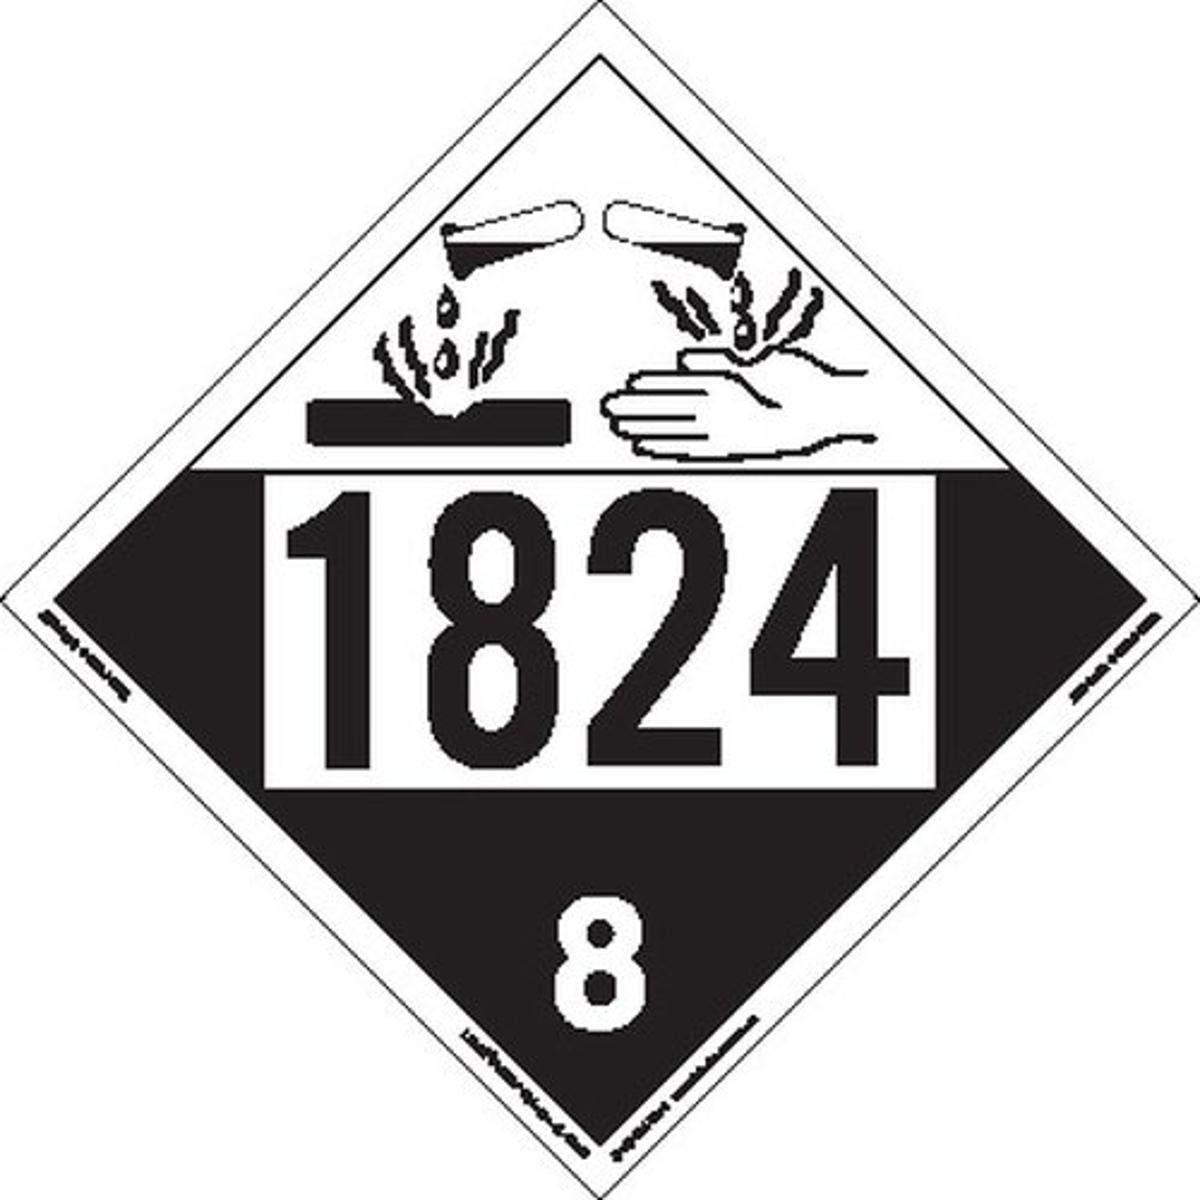 Labelmaster ZT4-1824 Limited price UN 1824 Cheap super special price Tagboard Placard Corrosive Hazmat